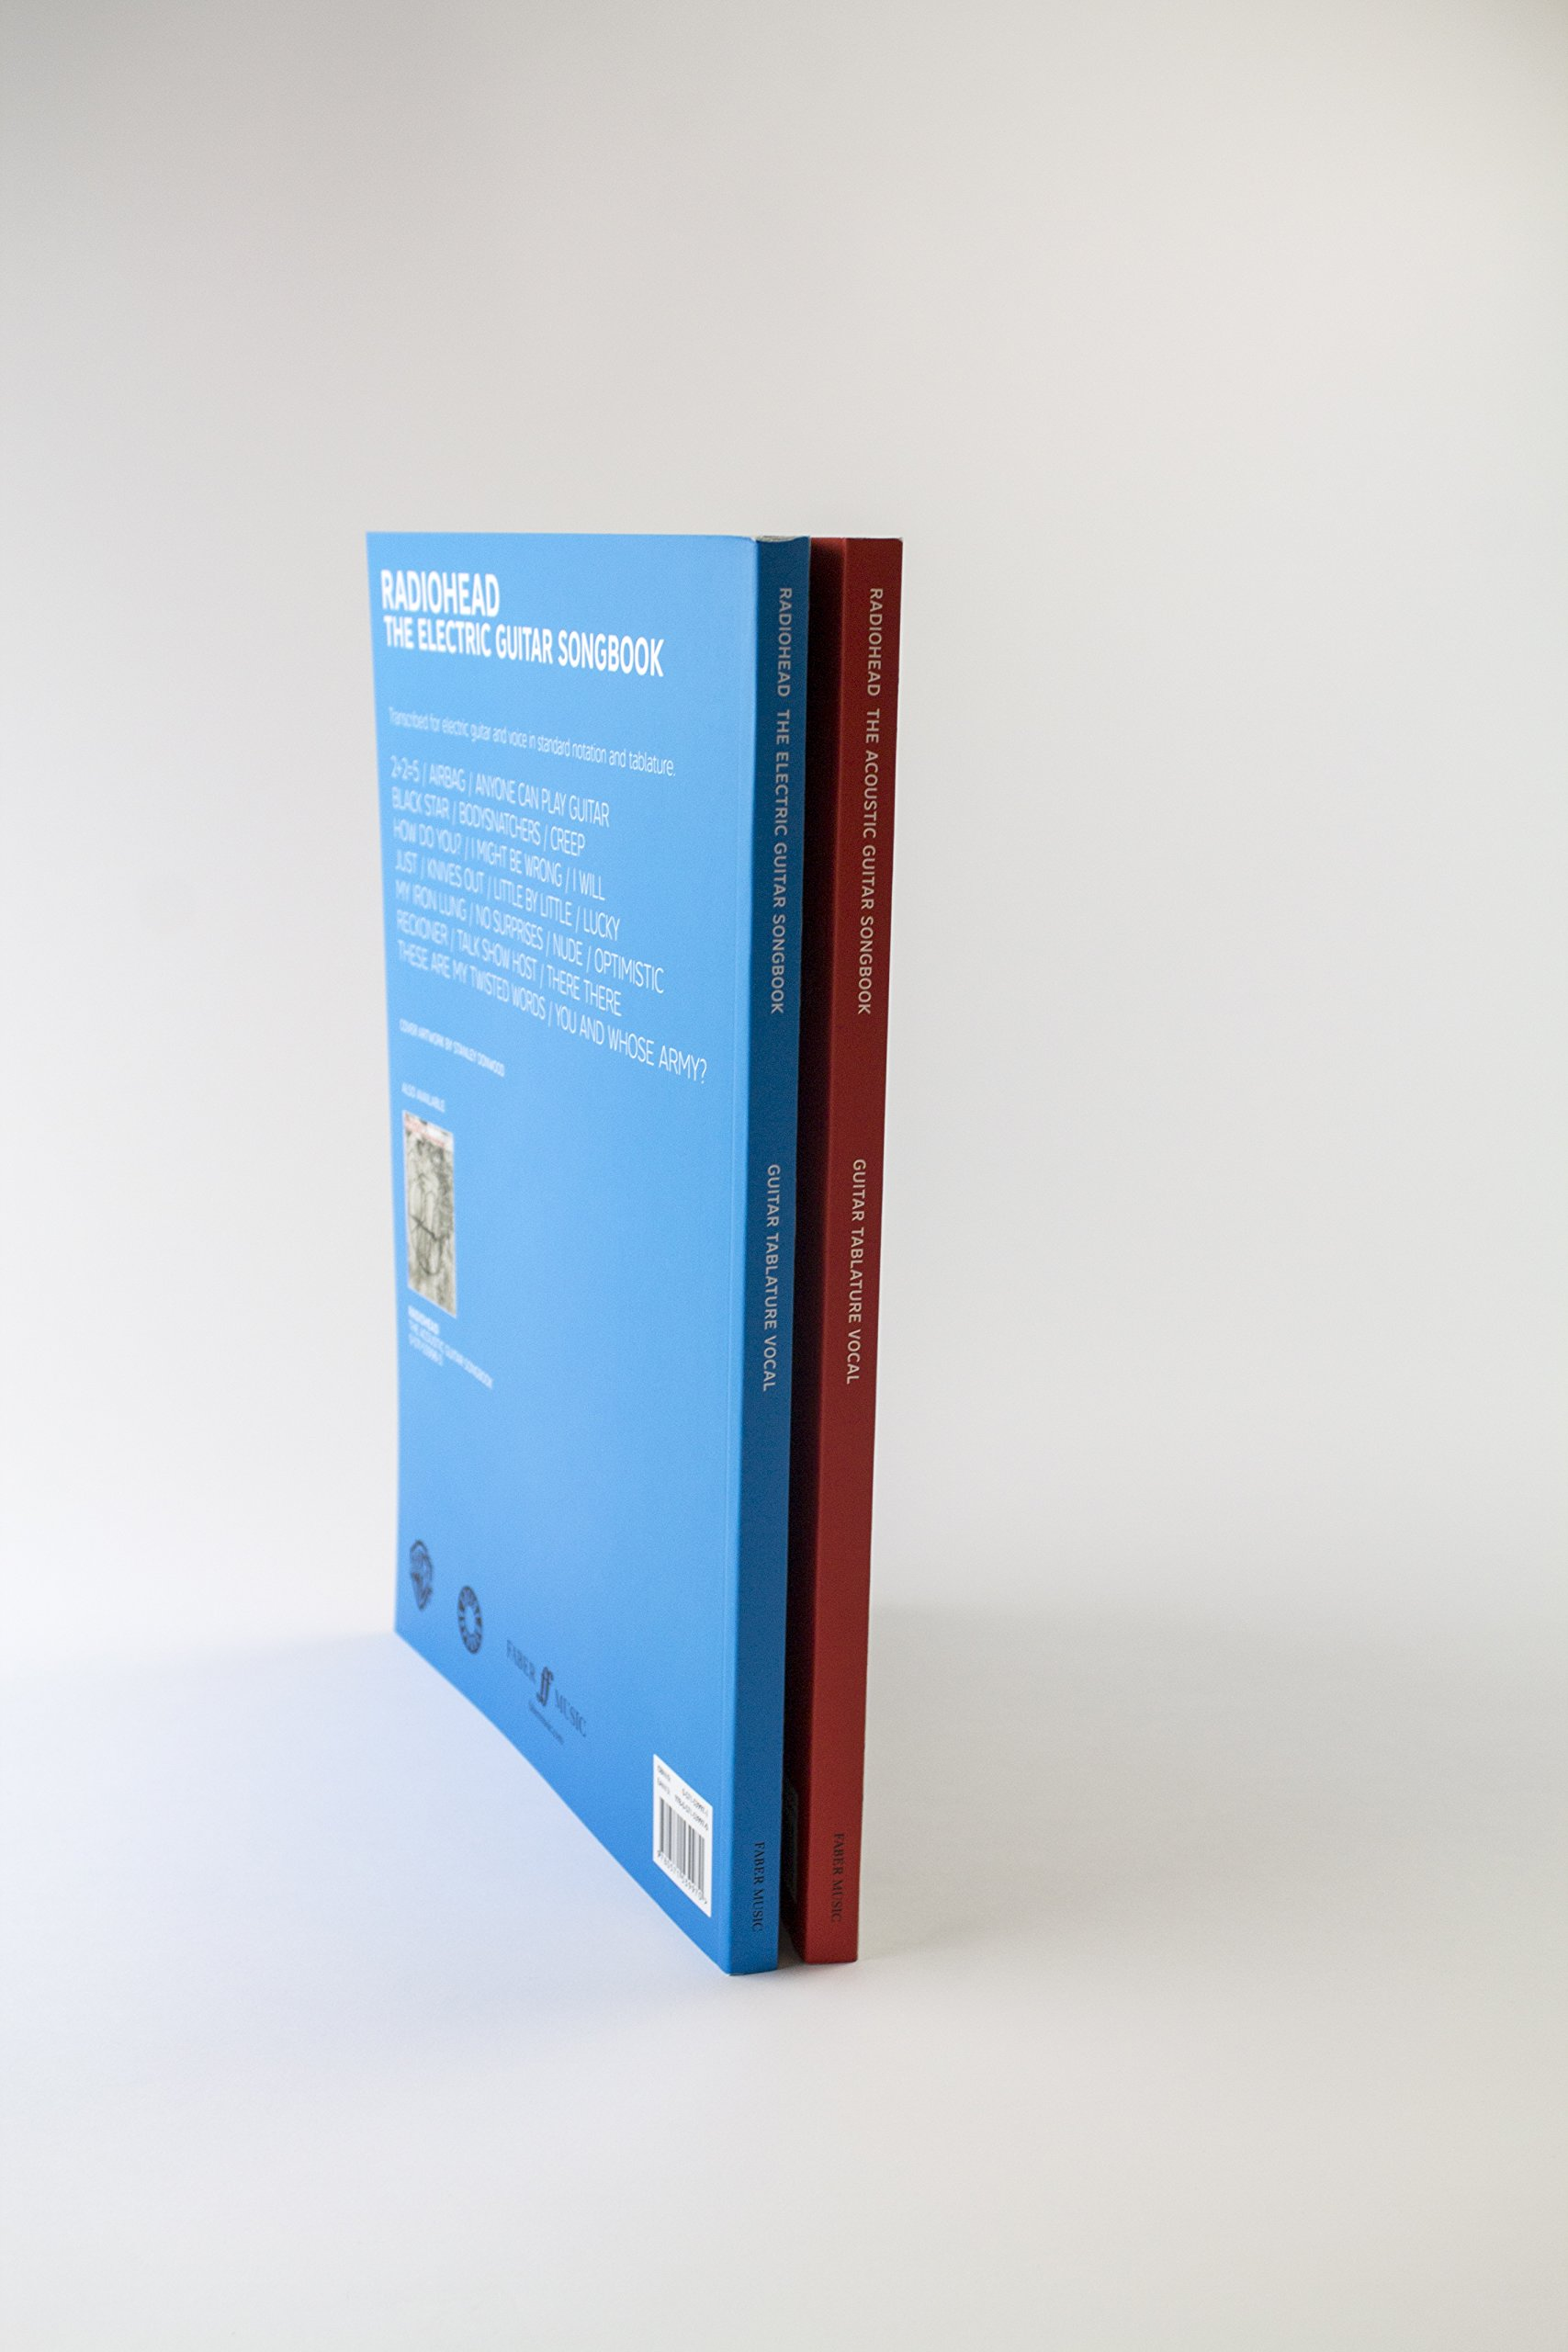 Amazon Radiohead The Electric Guitar Songbook 9780571539970